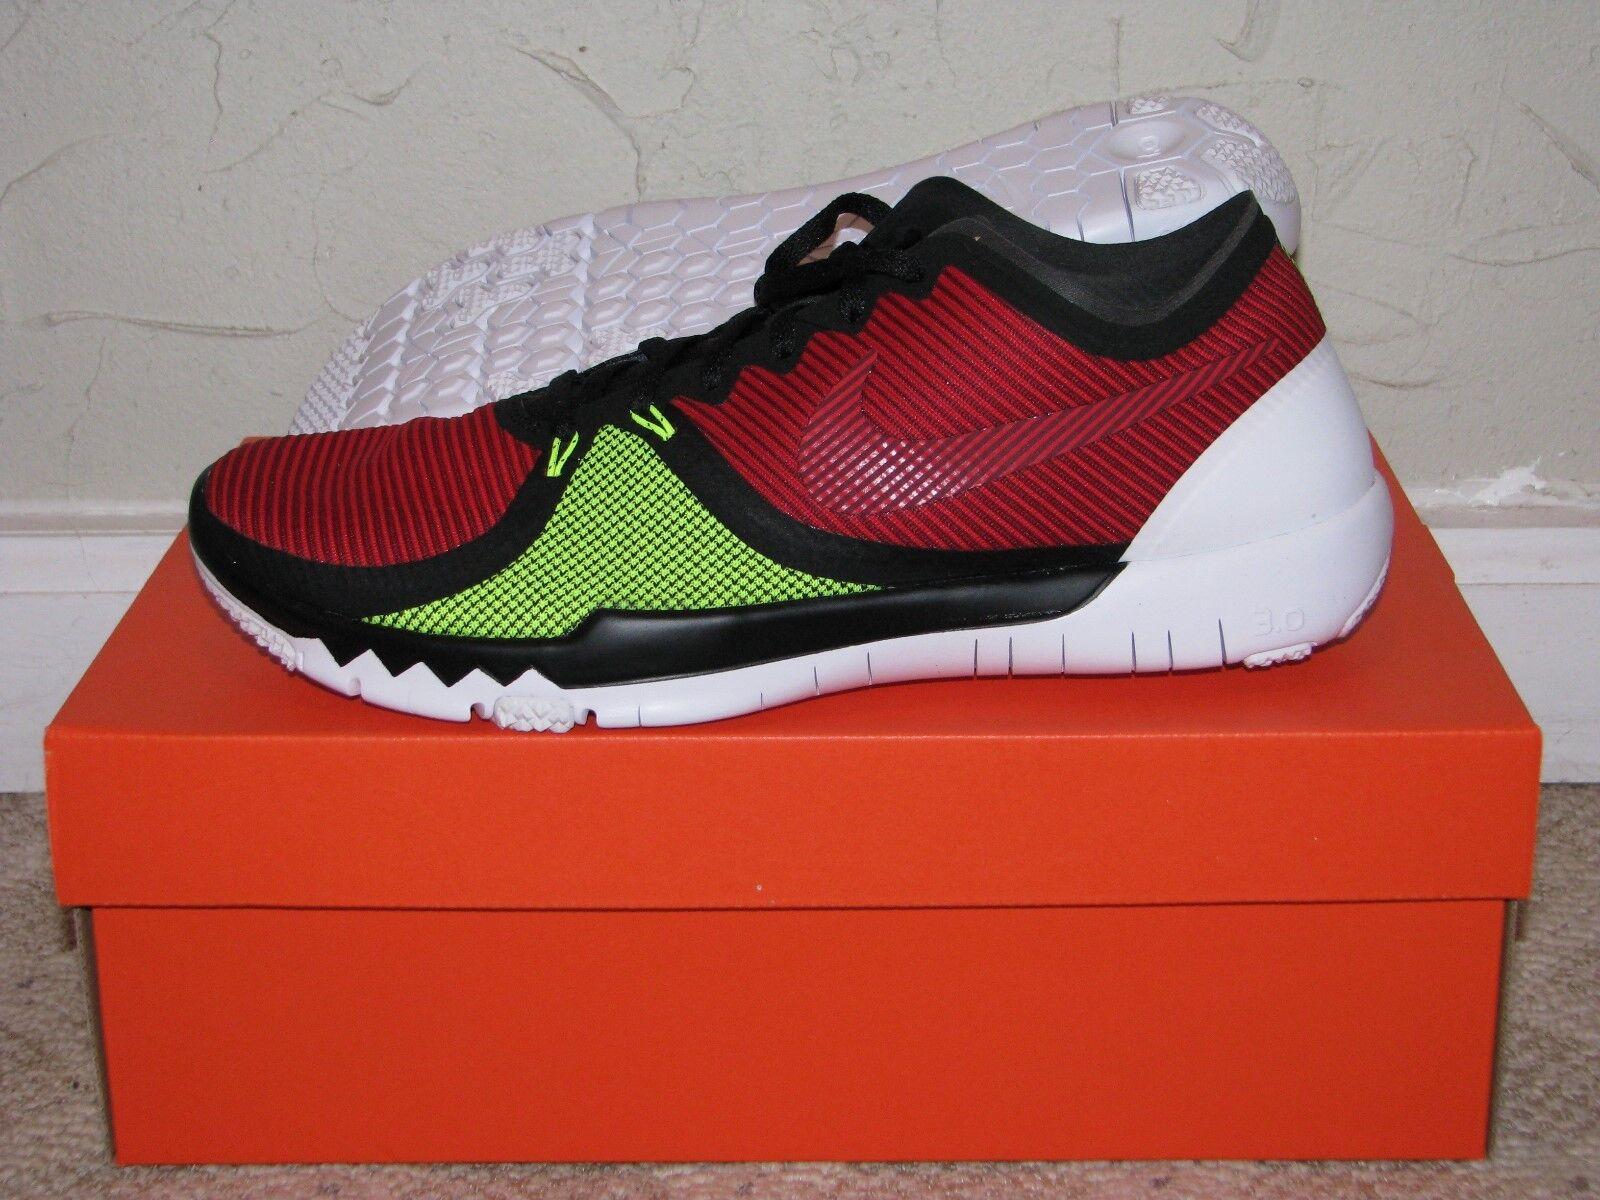 Nike Free Trainer 3.0 V4 Black   Red   Volt Mens Size 10 DS NEW  5.0 749361-066